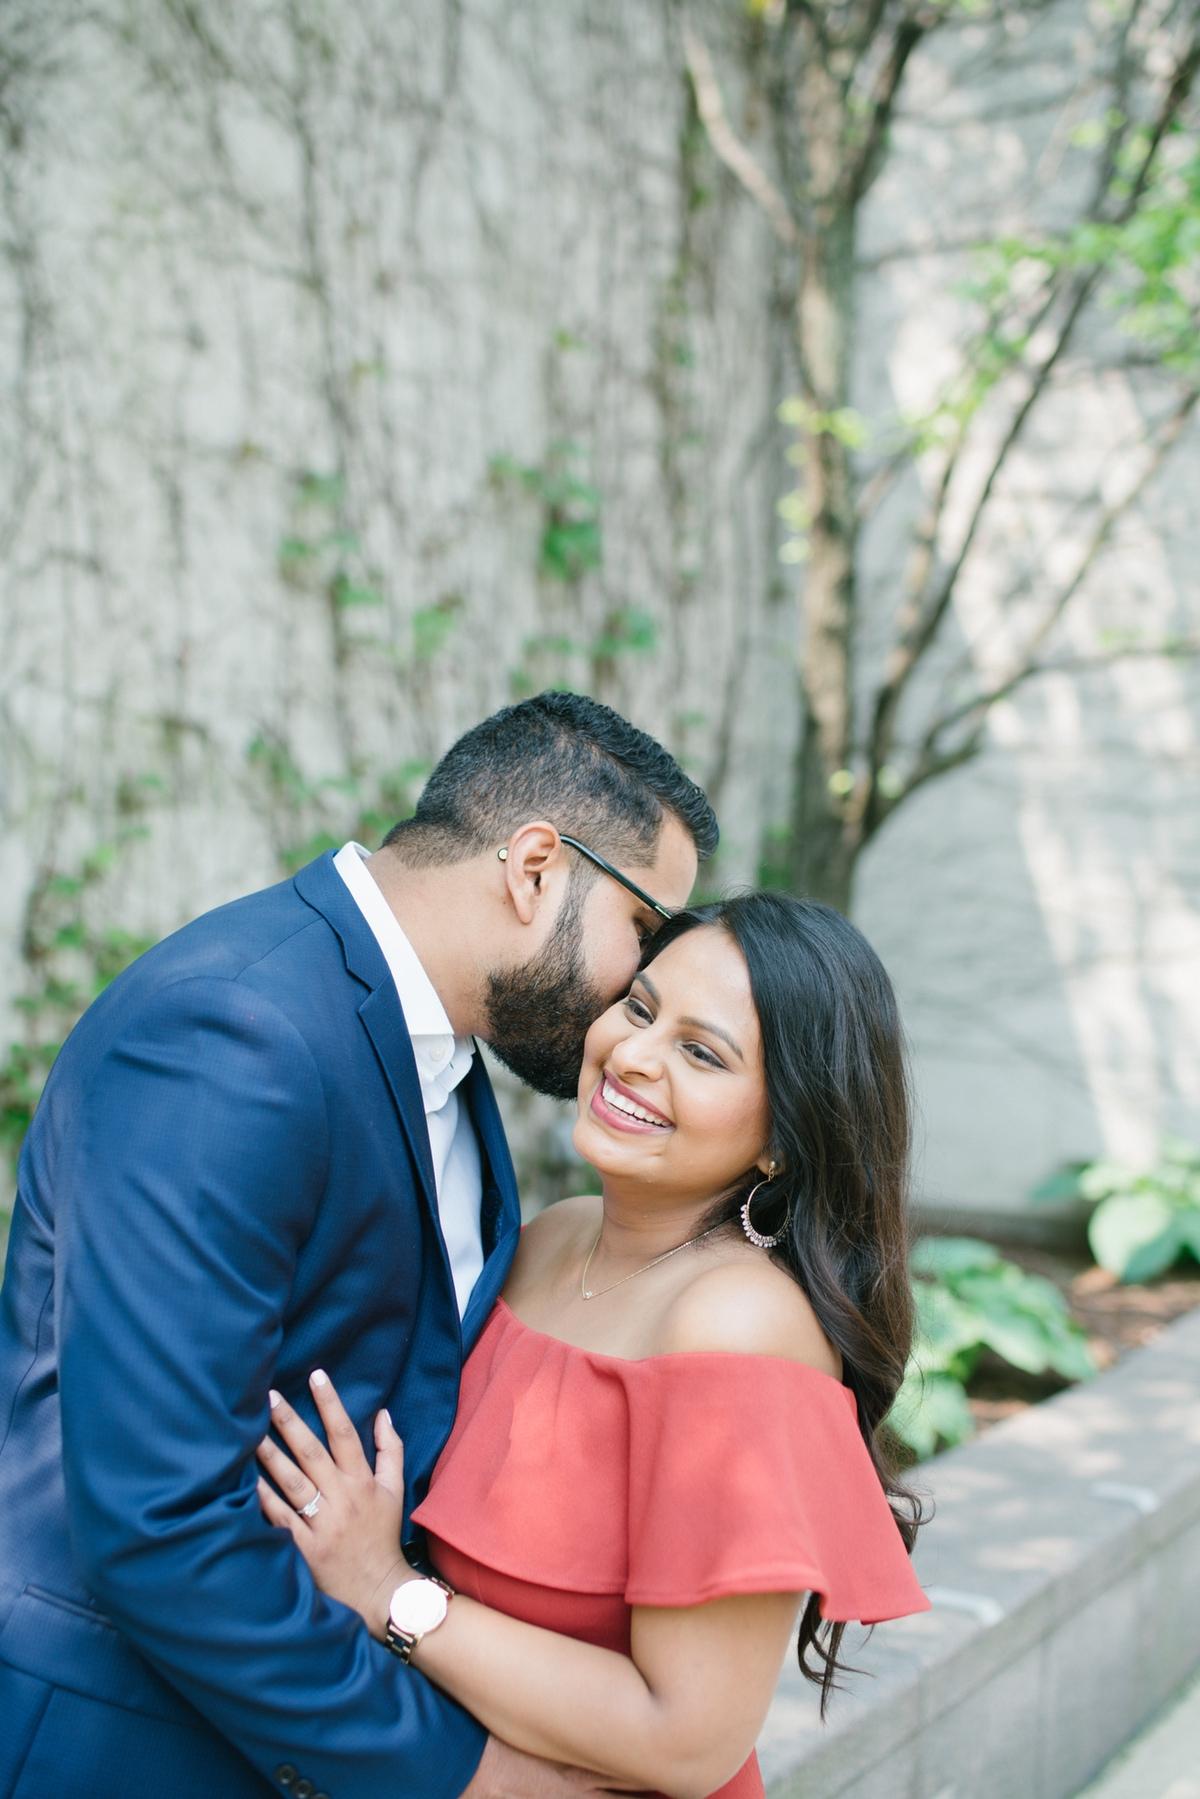 Le Cape Weddings - Sindhura - Chicago Engagement Session_-6.jpg